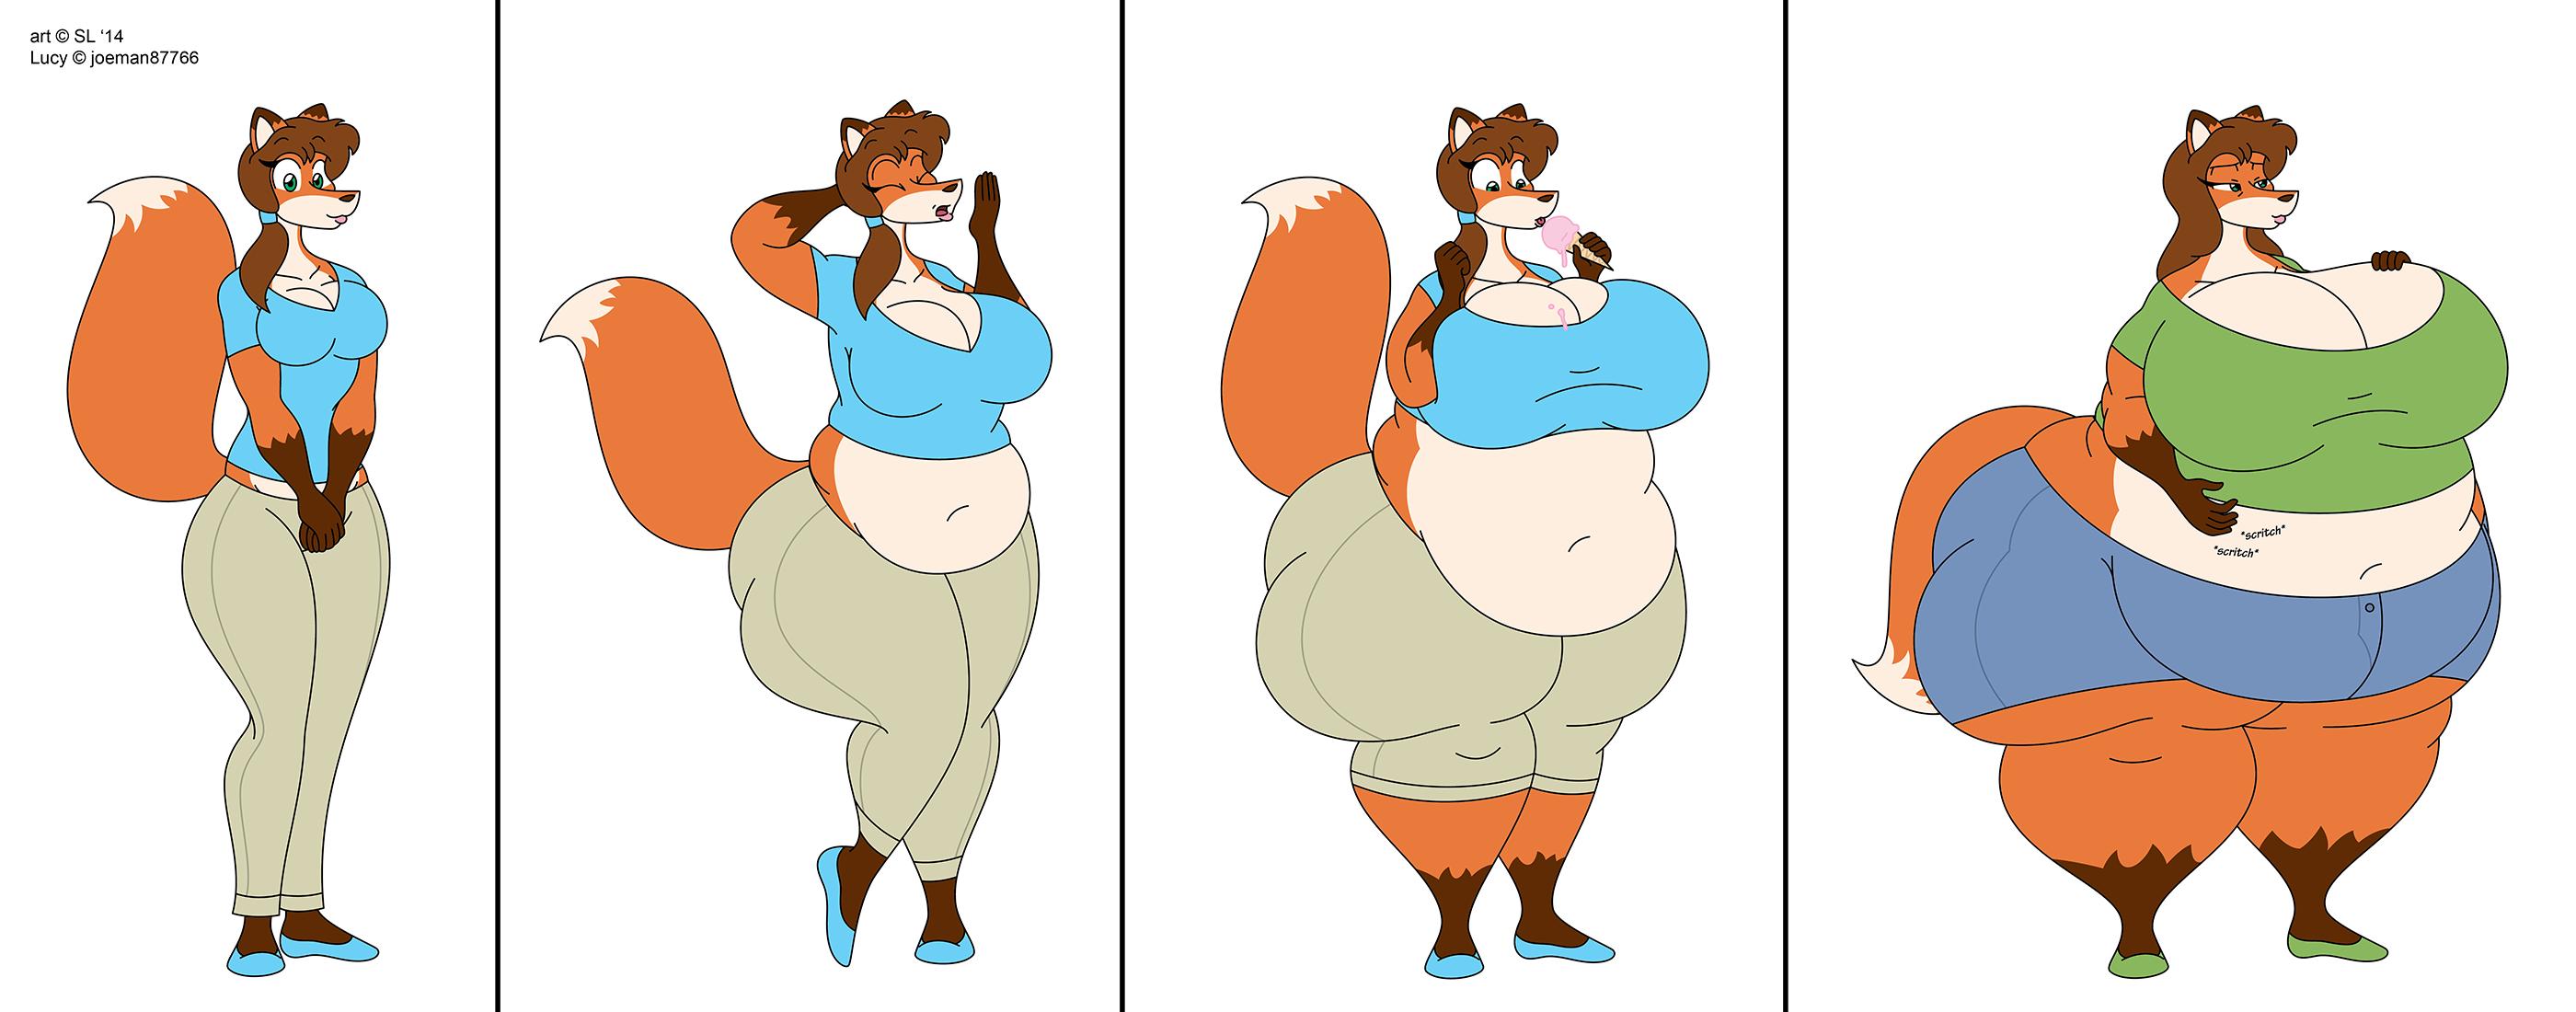 A Fattening Vixen: Part 1 by SatsumaLord on DeviantArt